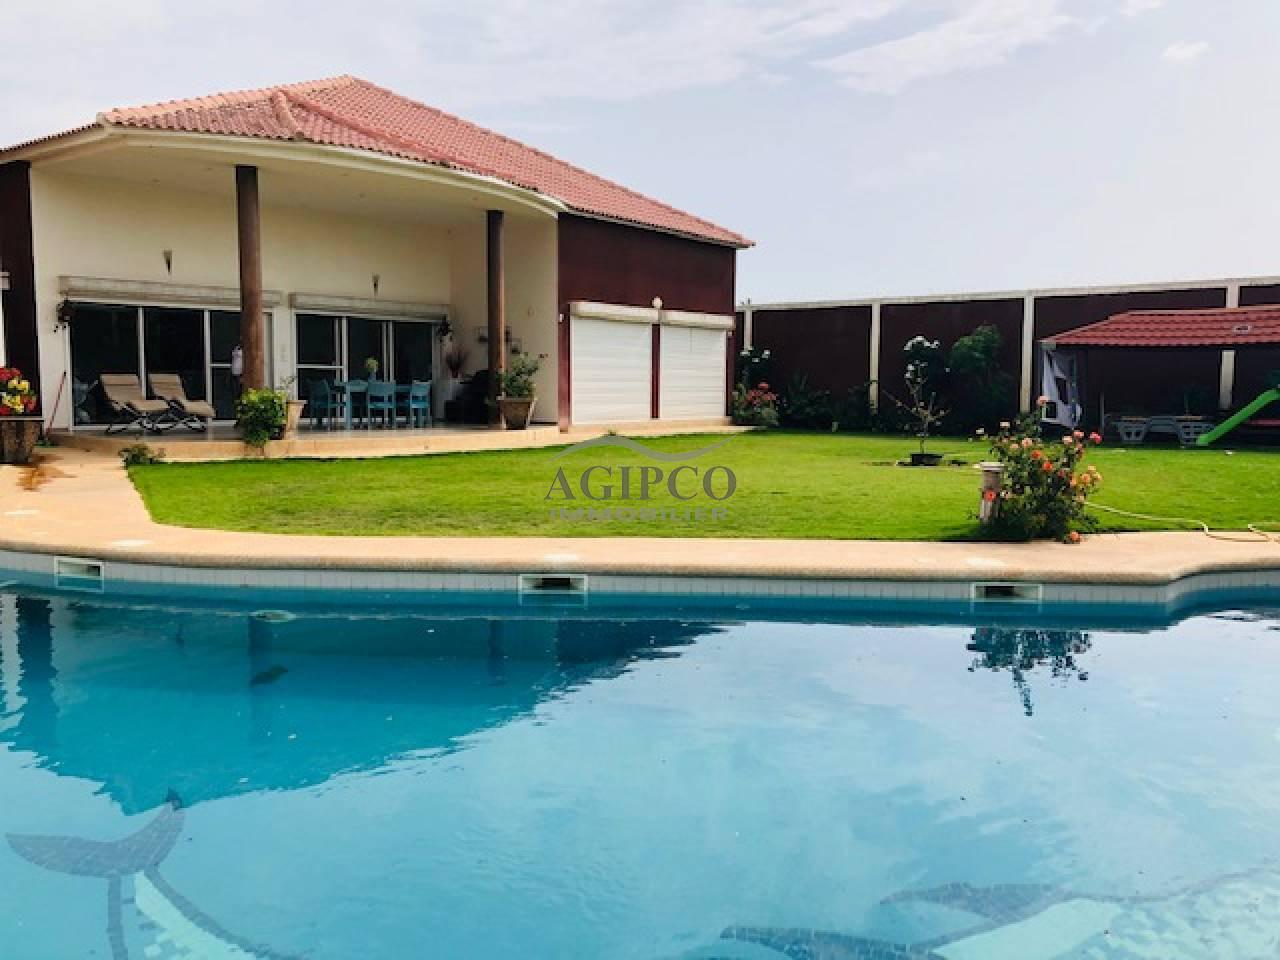 A vendre villa individuelle Saly Joseph